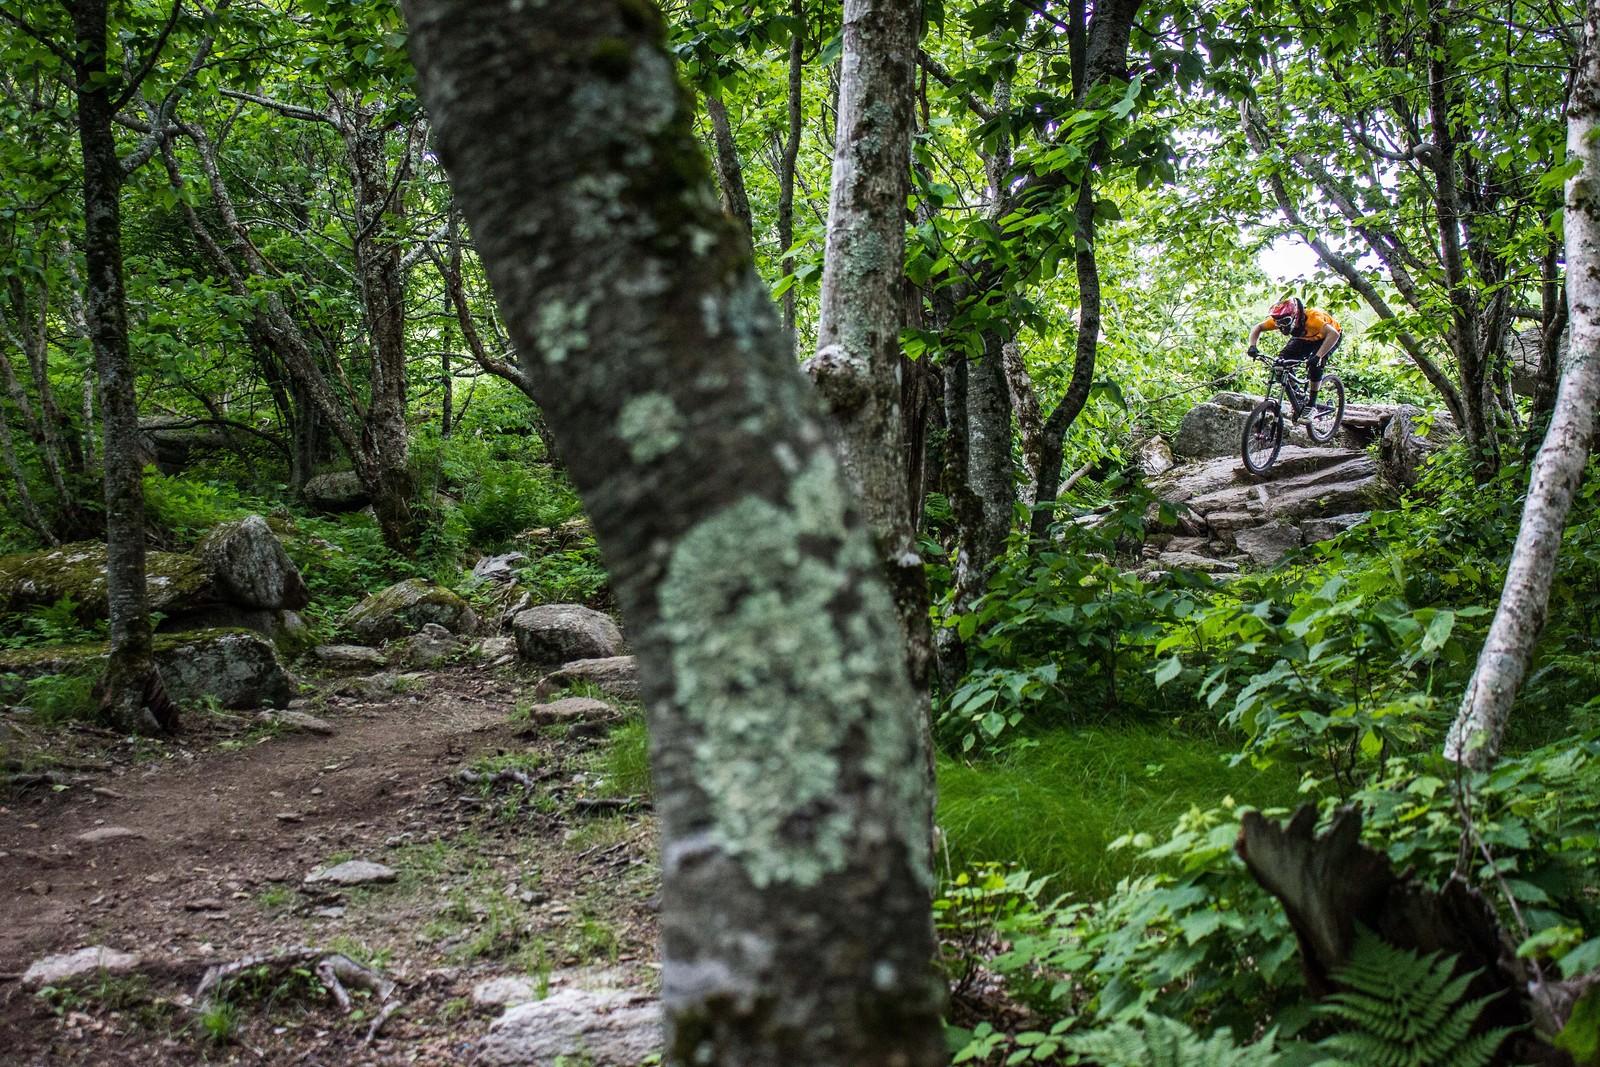 IMG 3424 - mtndrew - Mountain Biking Pictures - Vital MTB